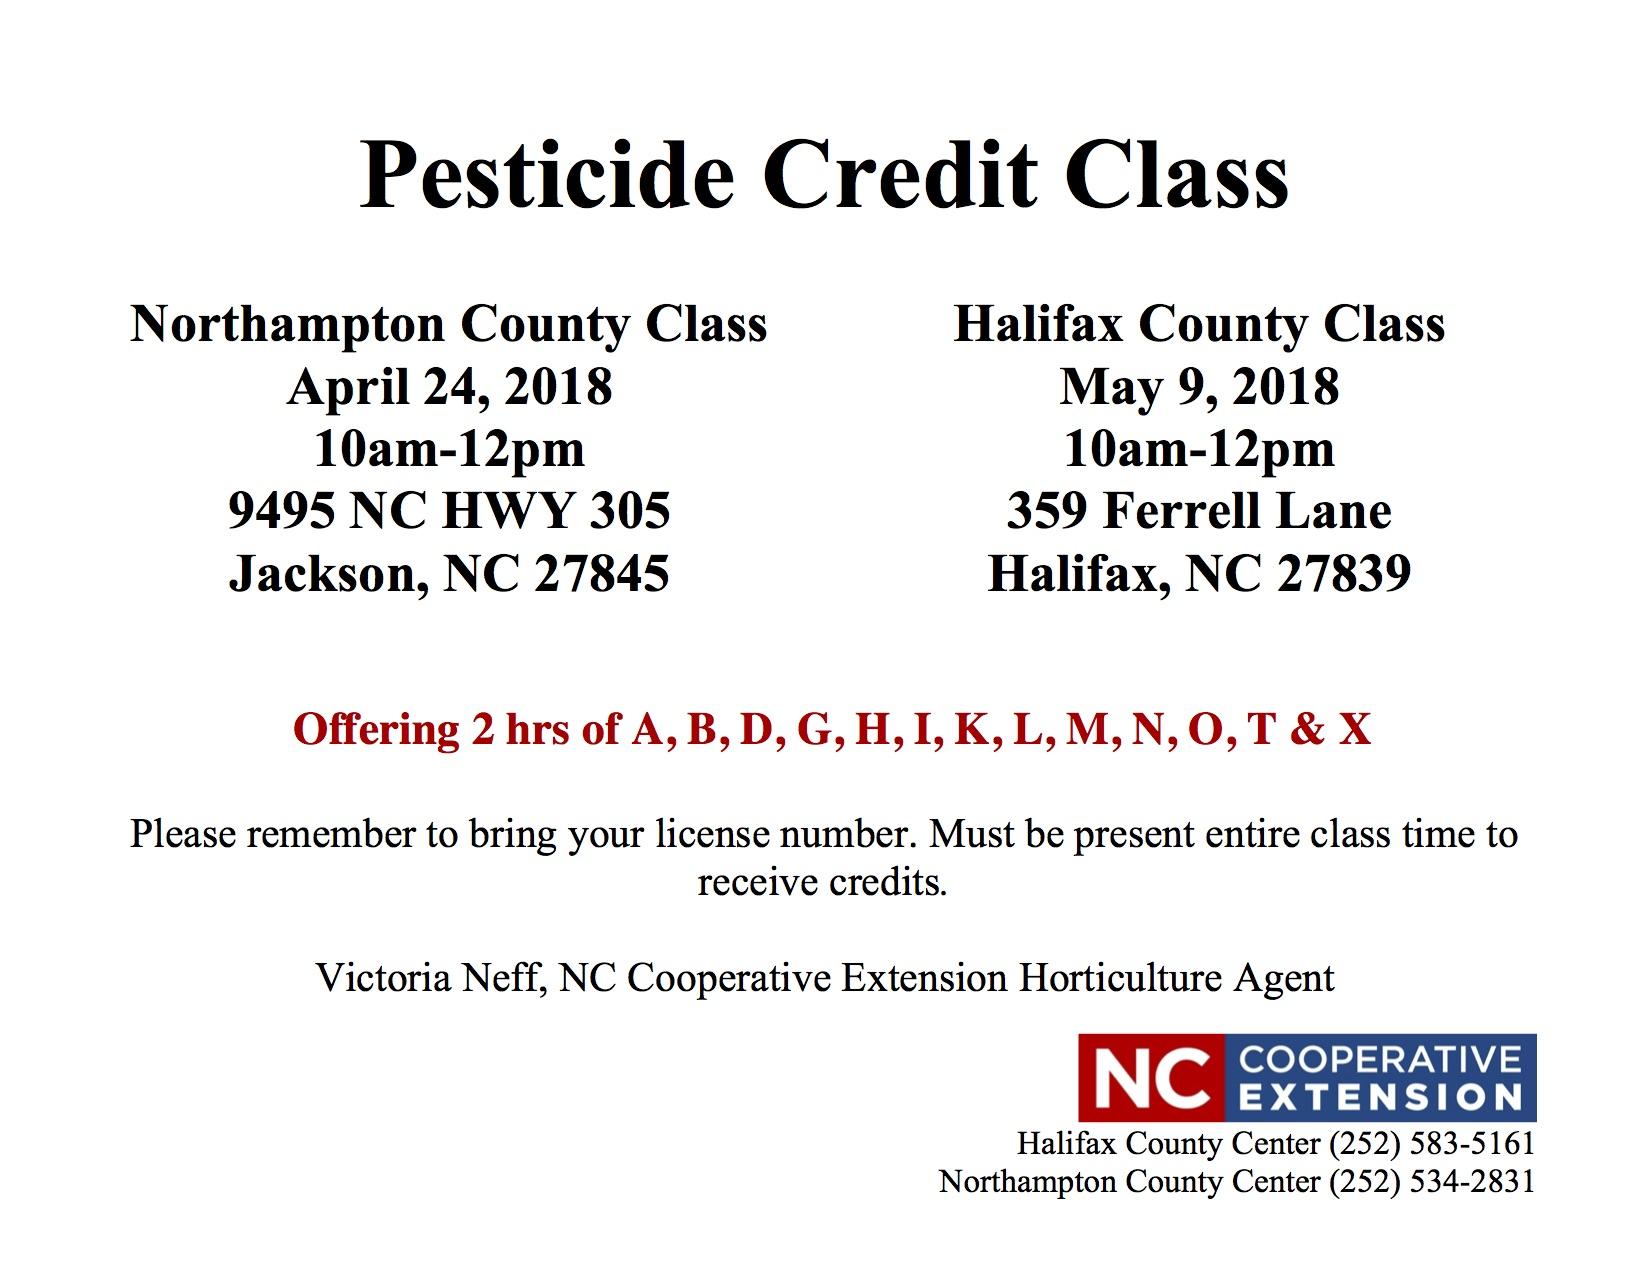 Pesticide Credit Class flyer image